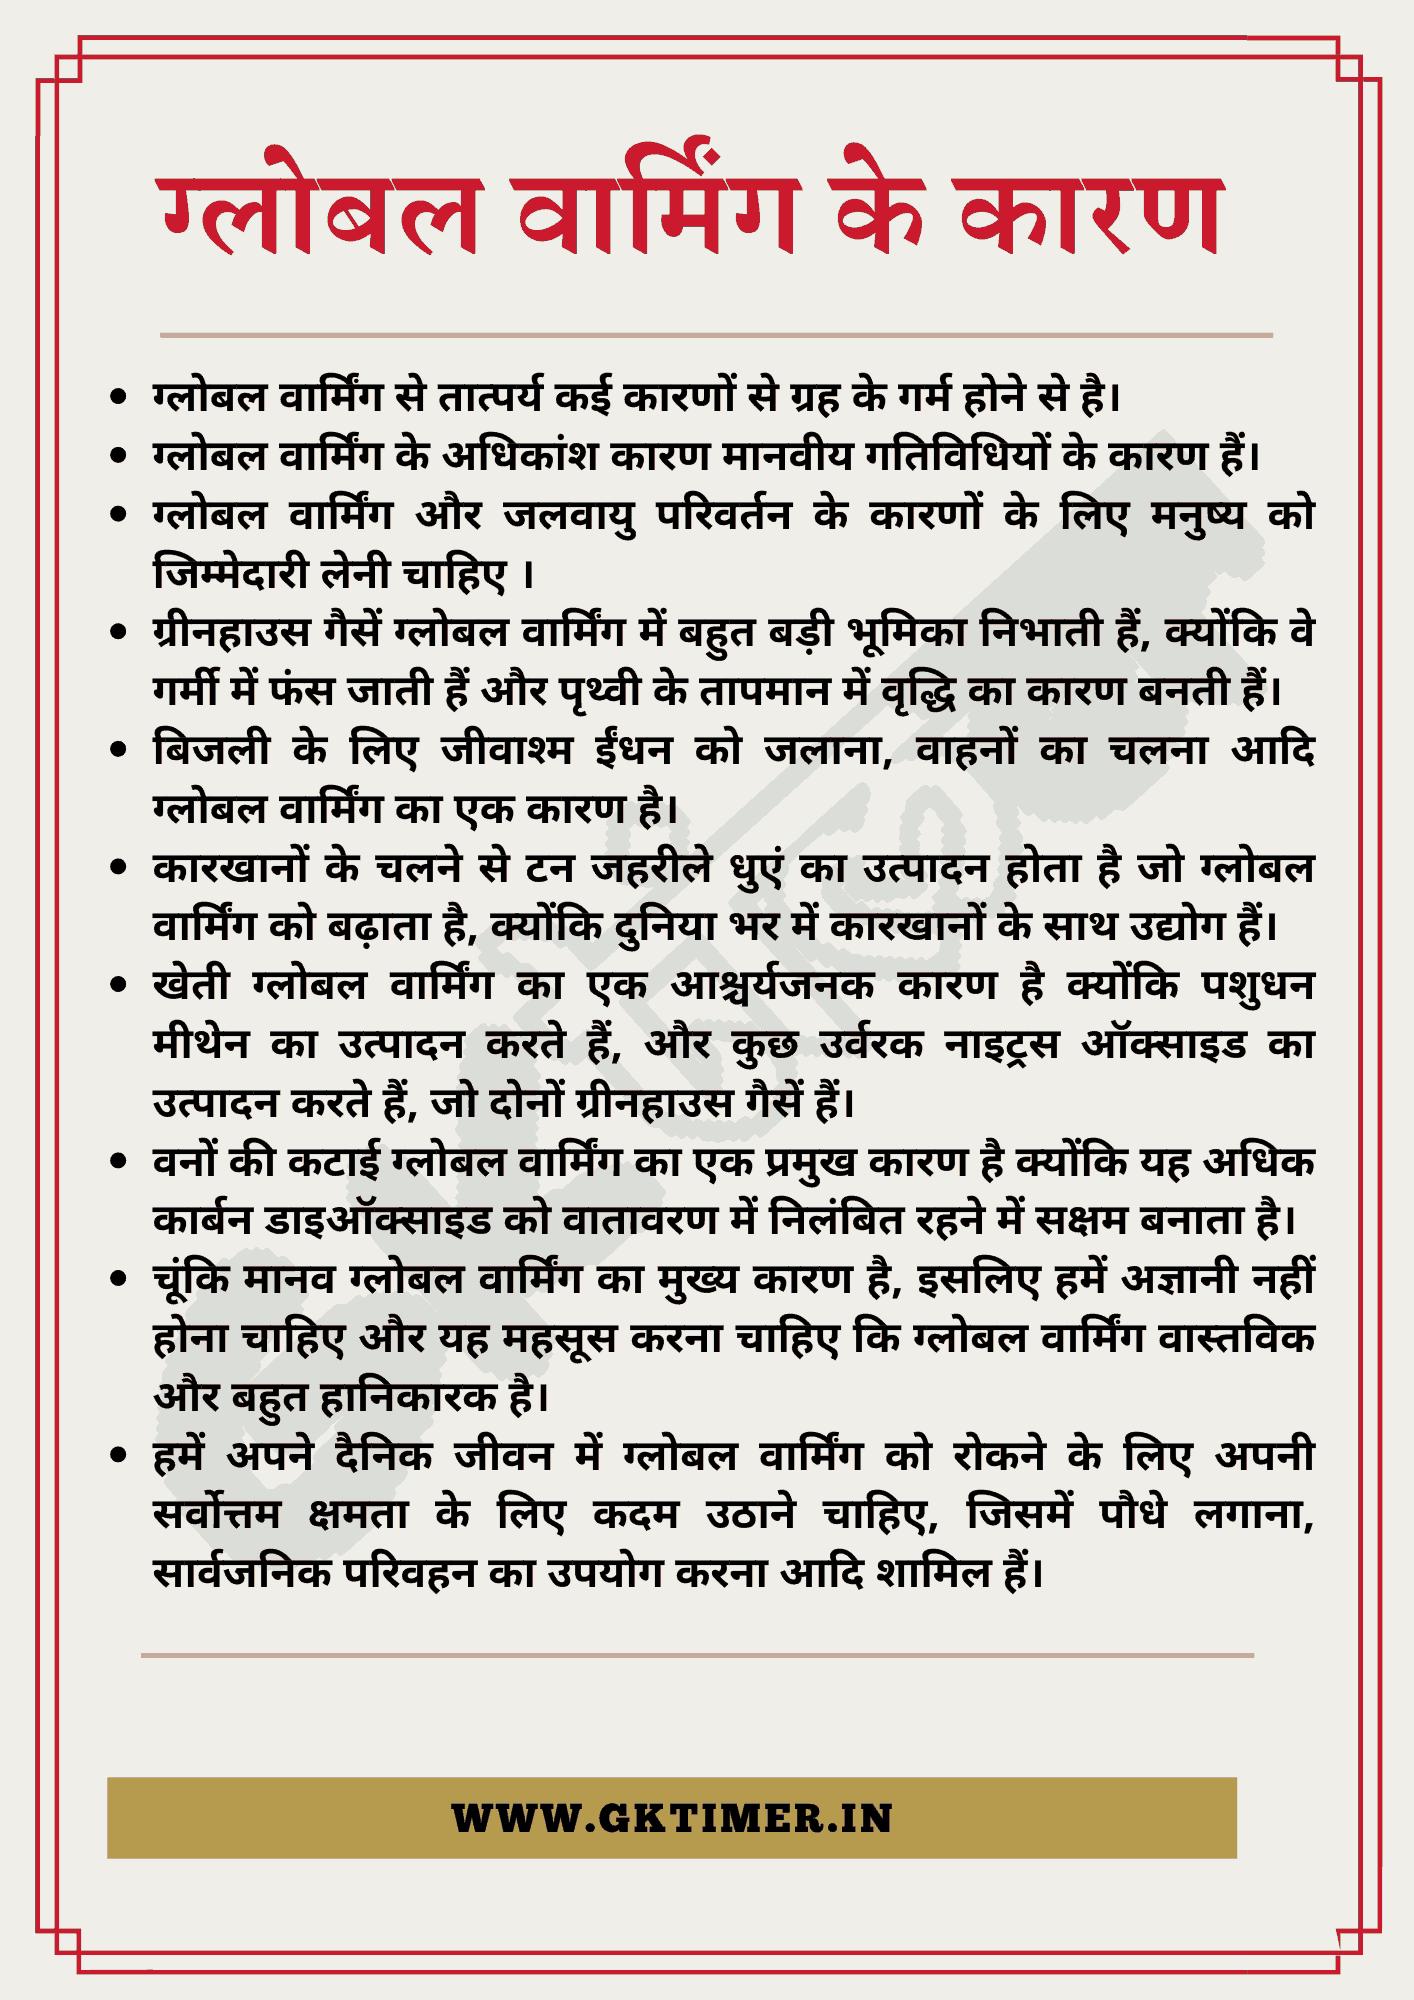 ग्लोबल वार्मिंग के कारण पर निबंध   Essay on Causes of Global Warming in Hindi   10 Lines on Causes of Global Warming in Hindi